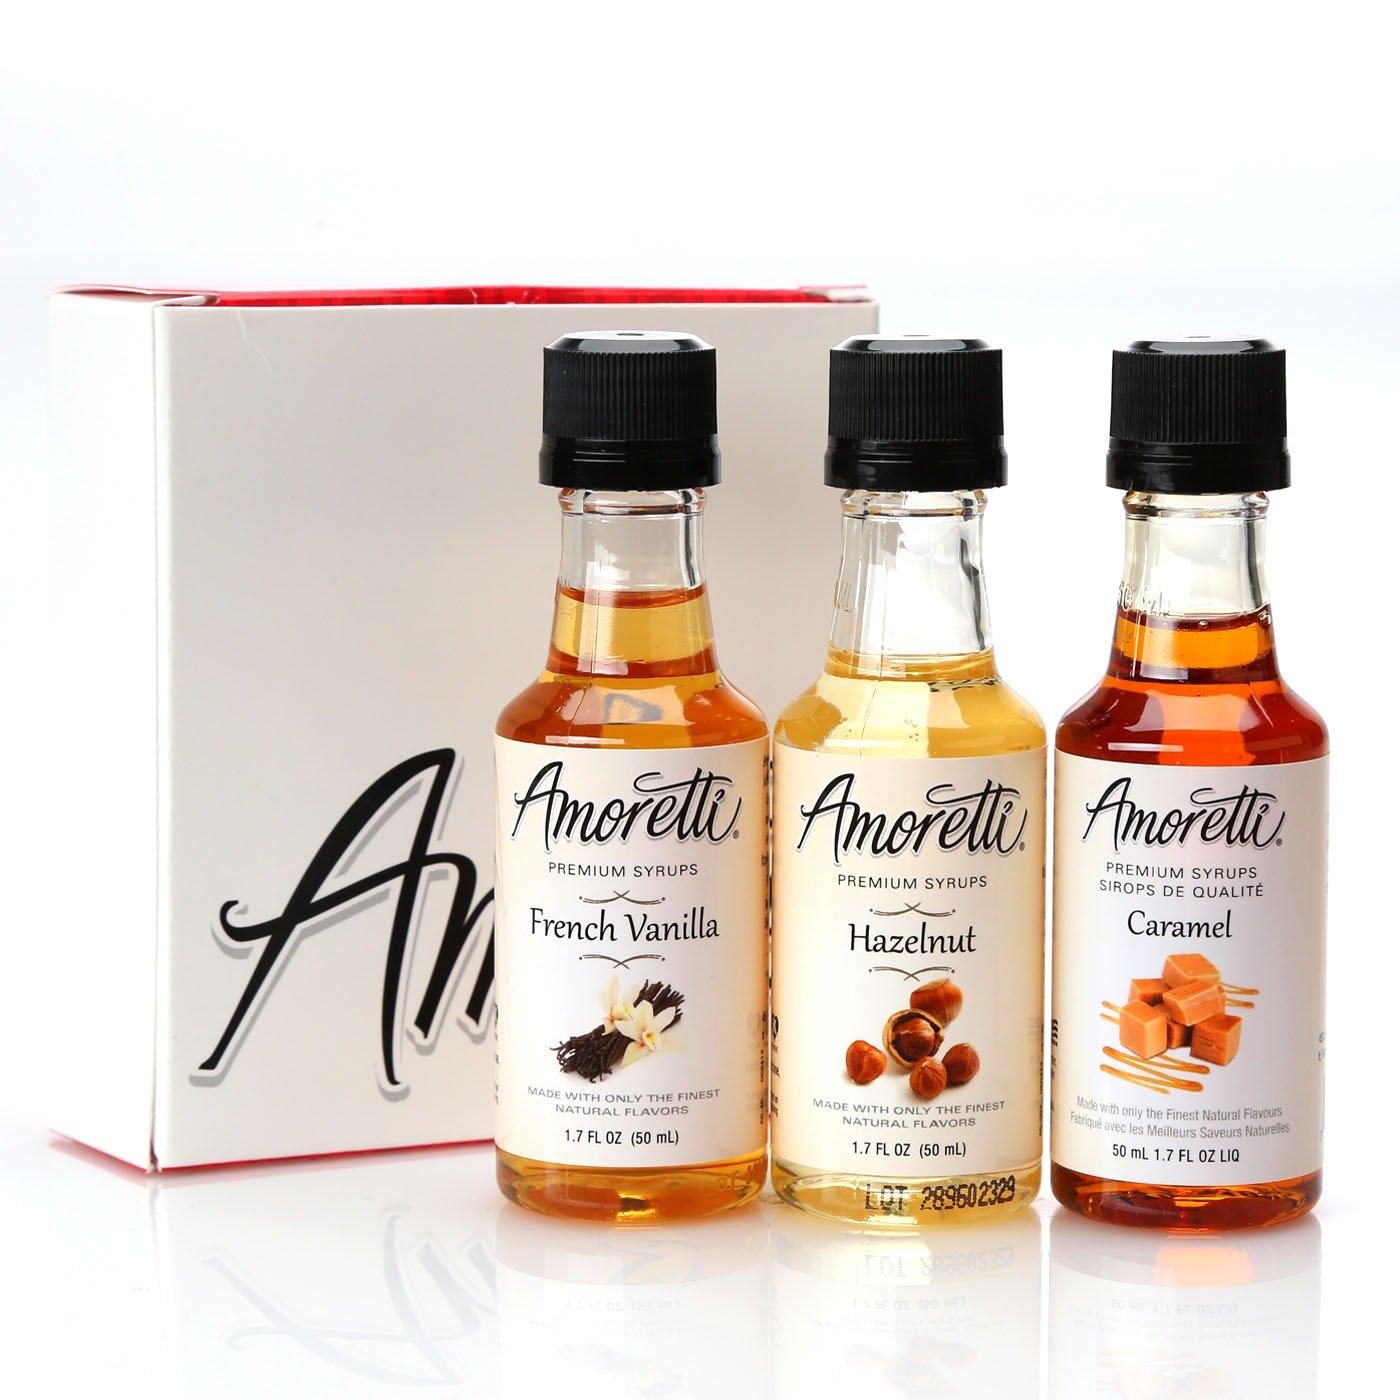 Amoretti Premium Classic Syrups 50ml 3 Pack (French Vanilla, Caramel, Hazelnut)